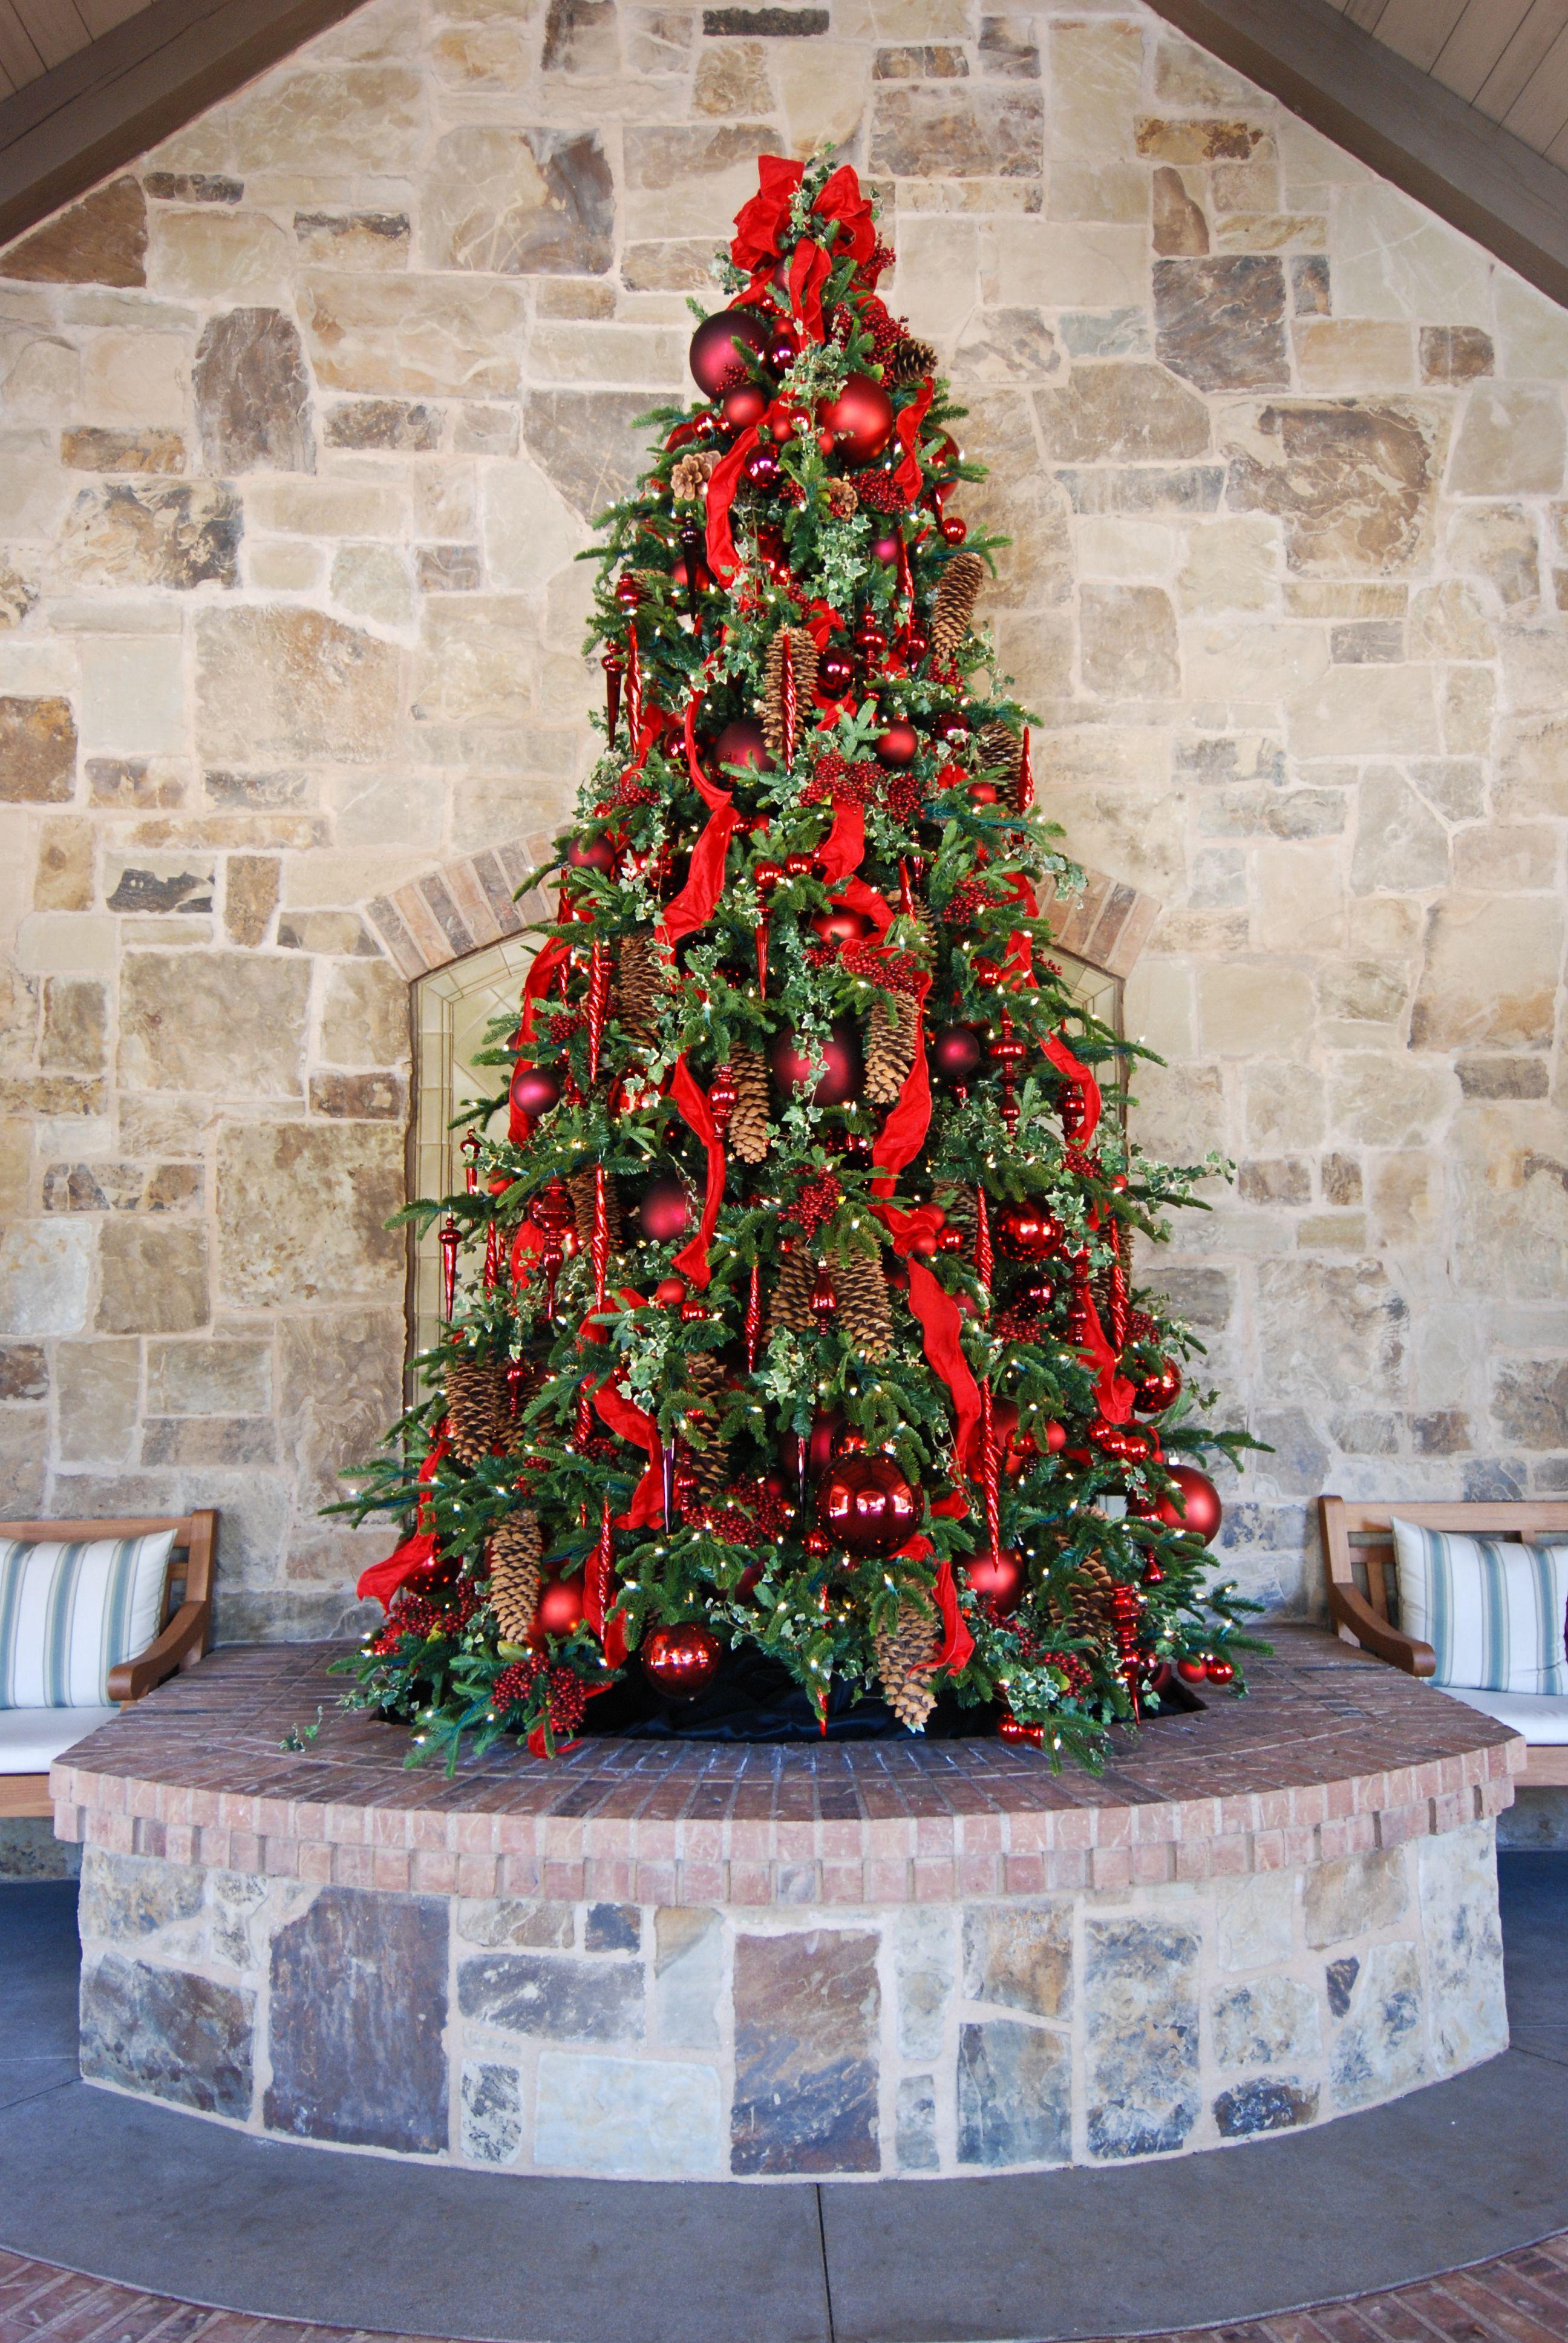 by Roger's Gardens design team Christmas celebrations